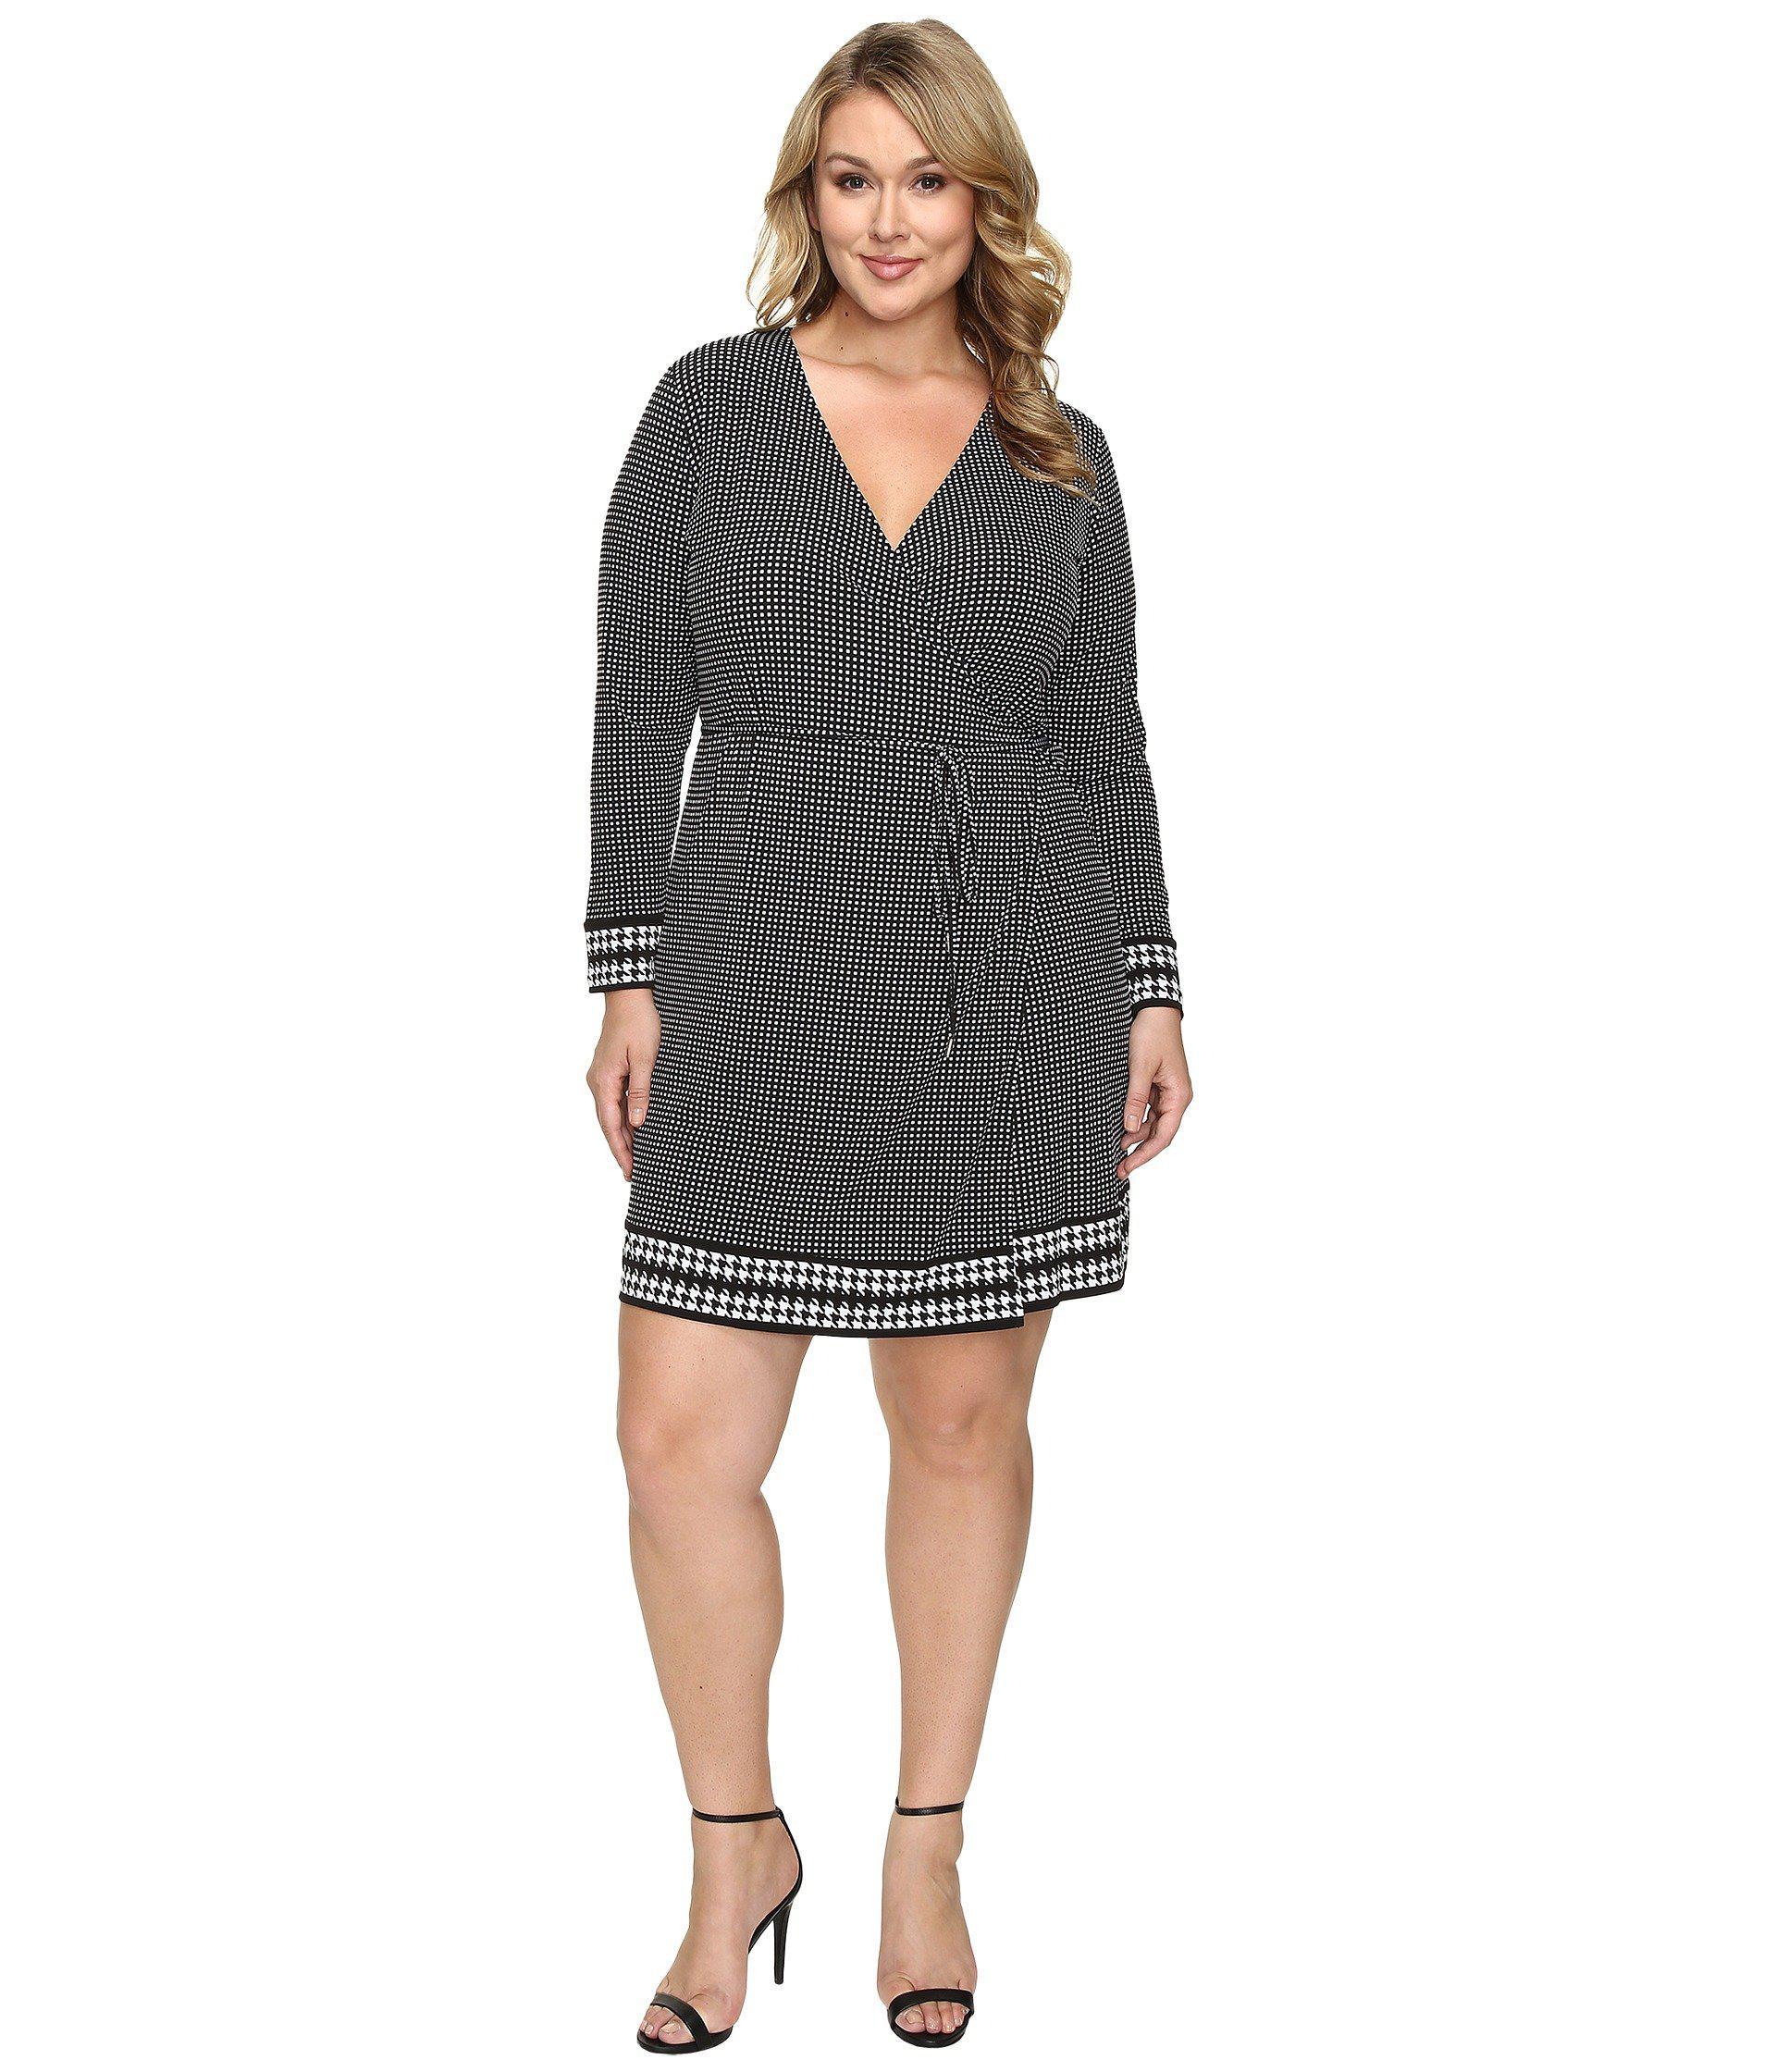 dd93402ec50 MICHAEL Michael Kors. Women s Black Plus Size Harget Border Wrap Dress